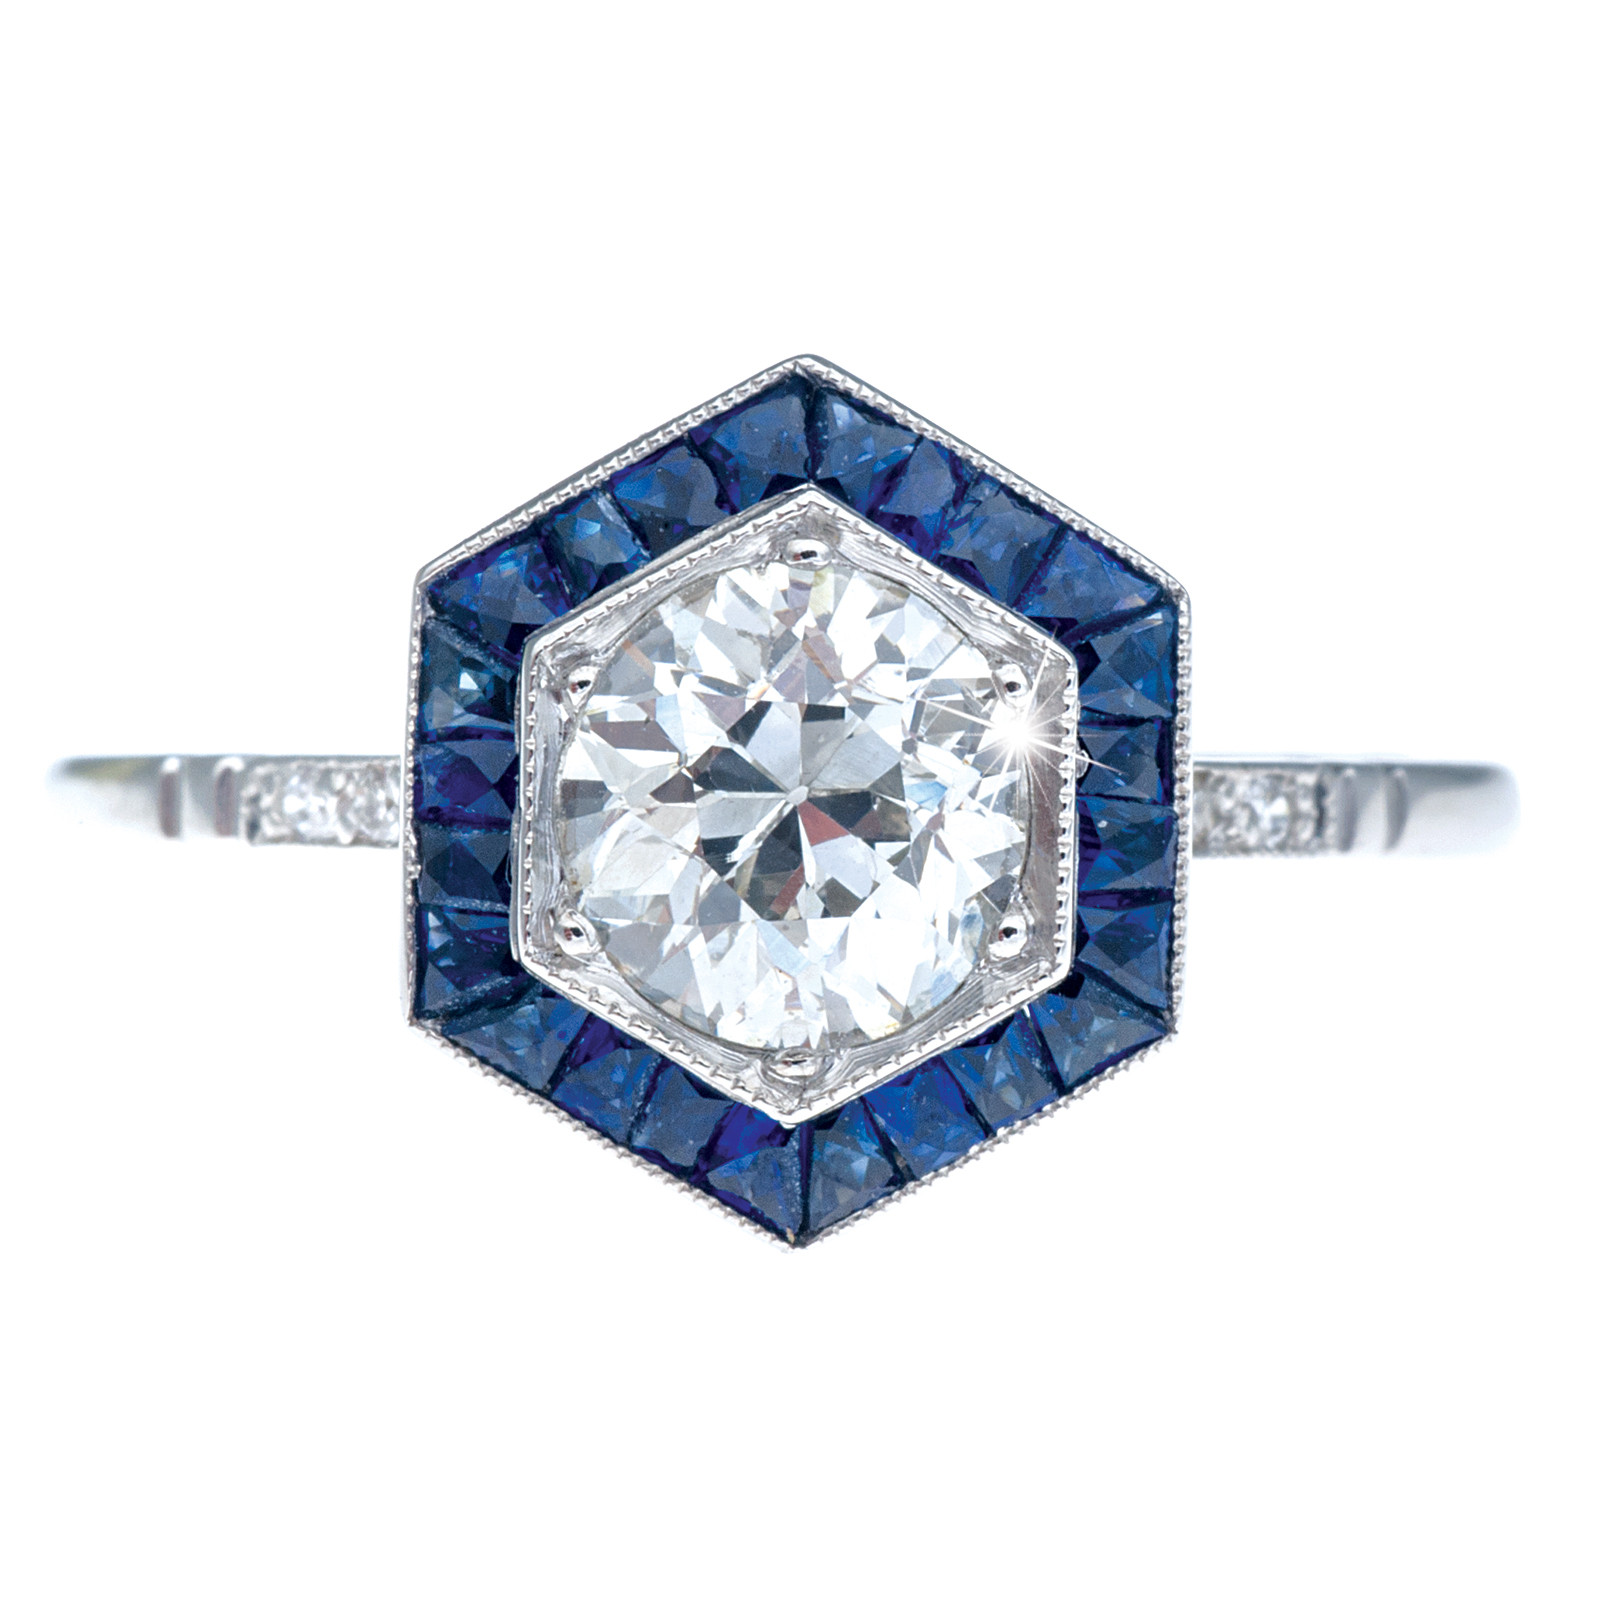 New Art Deco Inspired 0.94 CT Diamond & 0.75 CTW Sapphire Ring